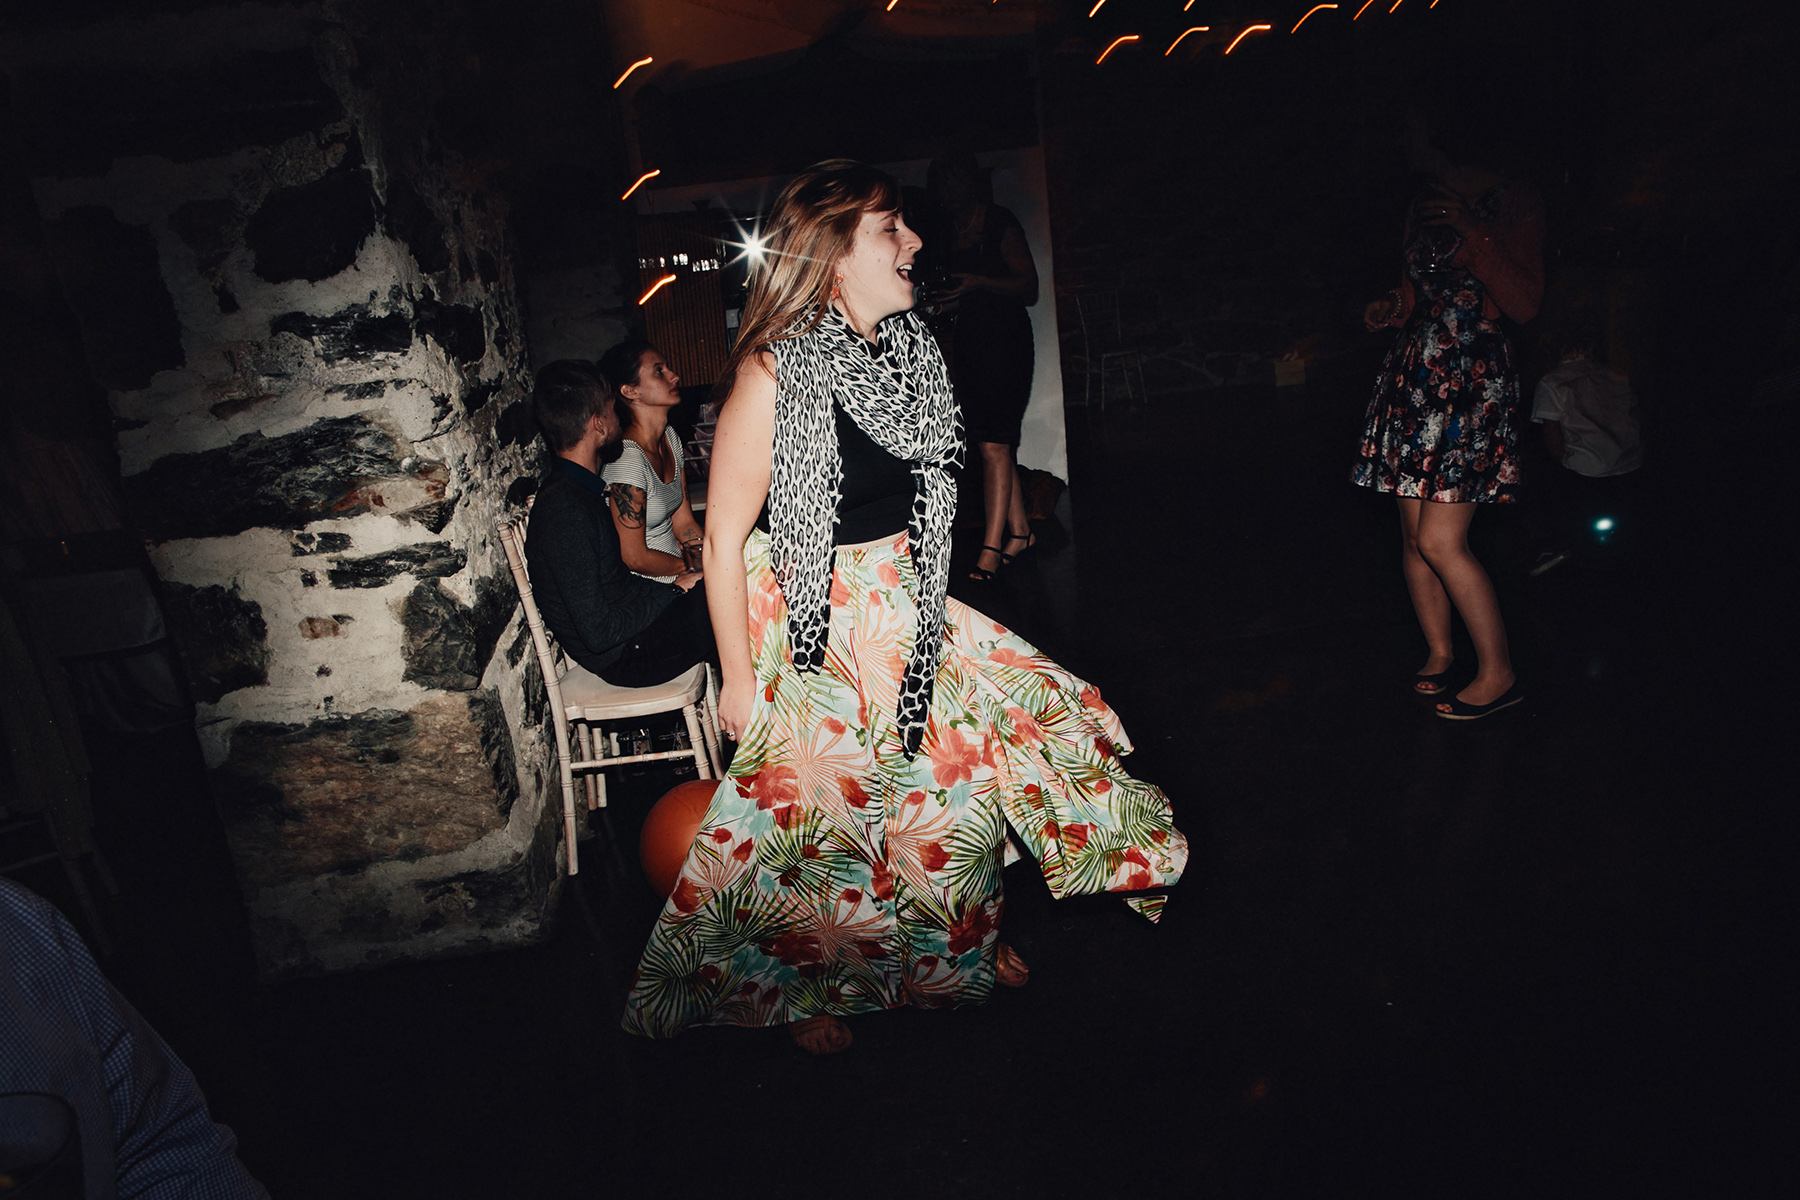 Snowdonia-Wales-Wedding-Photos-0412.jpg